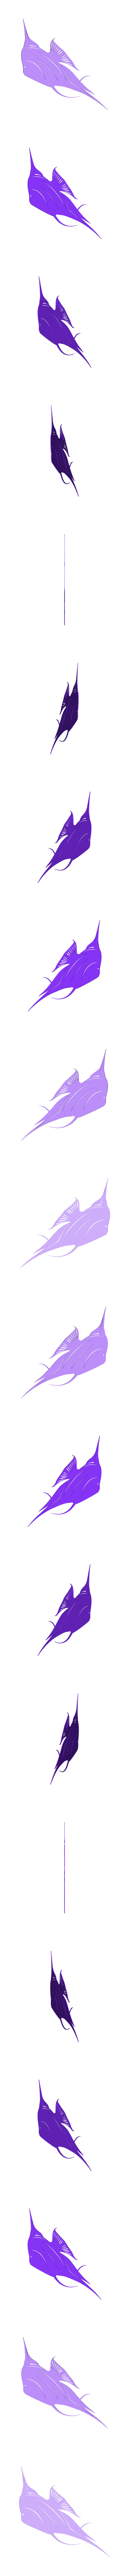 3_Angel_Single_2.stl Download STL file Angel fish wall art \ Decor • 3D printing object, 3dprintlines